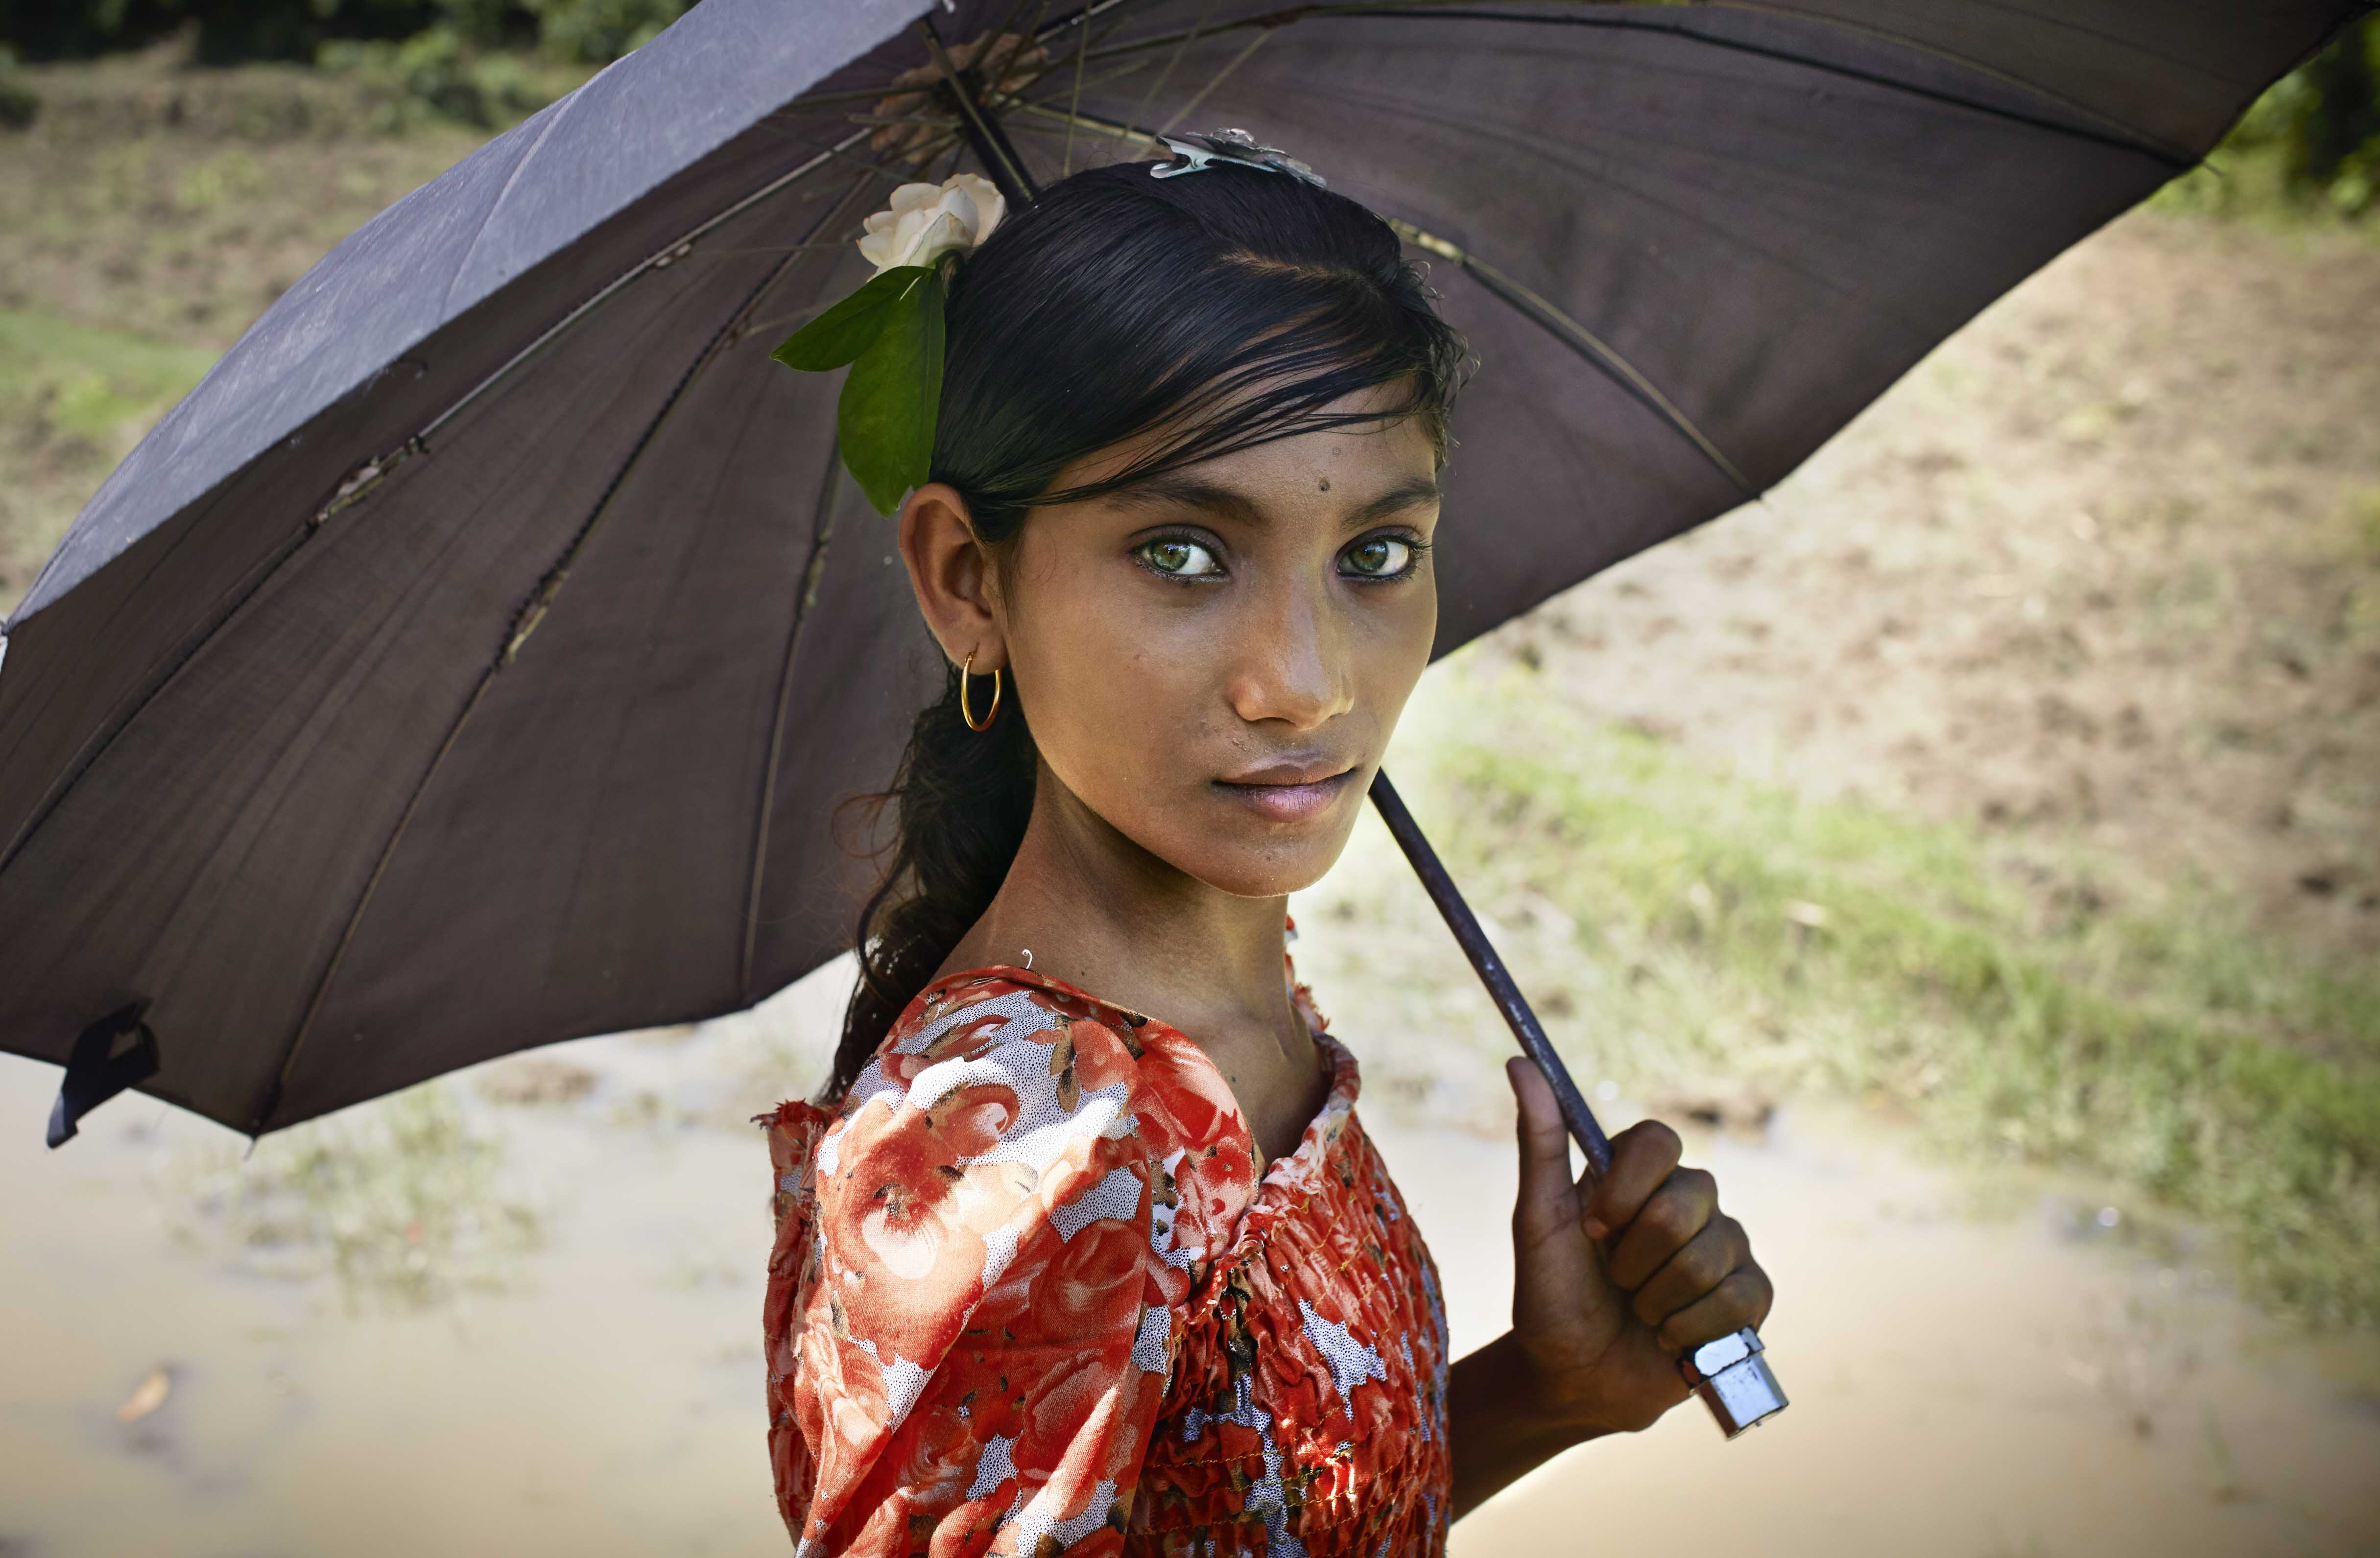 The Rohingyas Plight In Myanmar Veronique De Viguerie